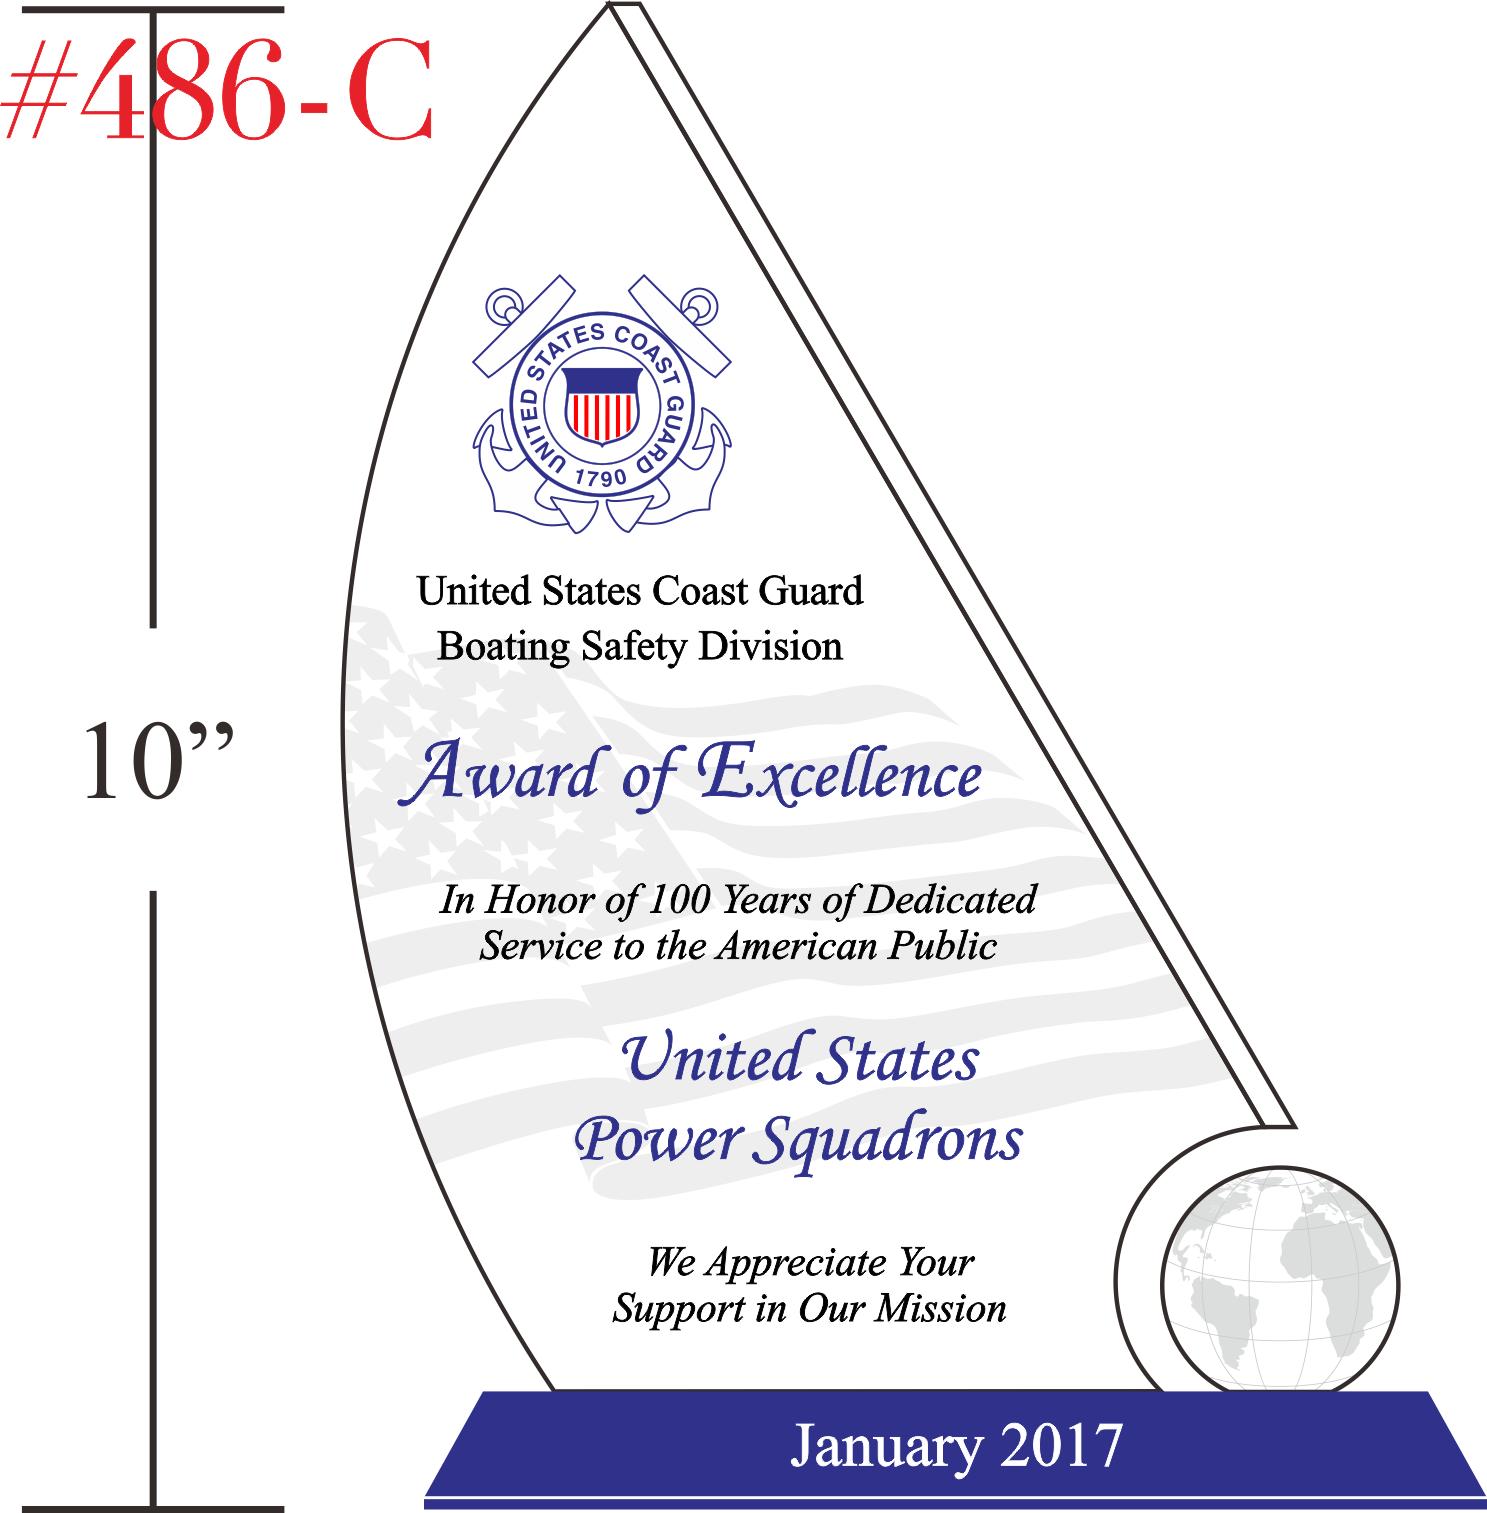 USCG Award of Excellence